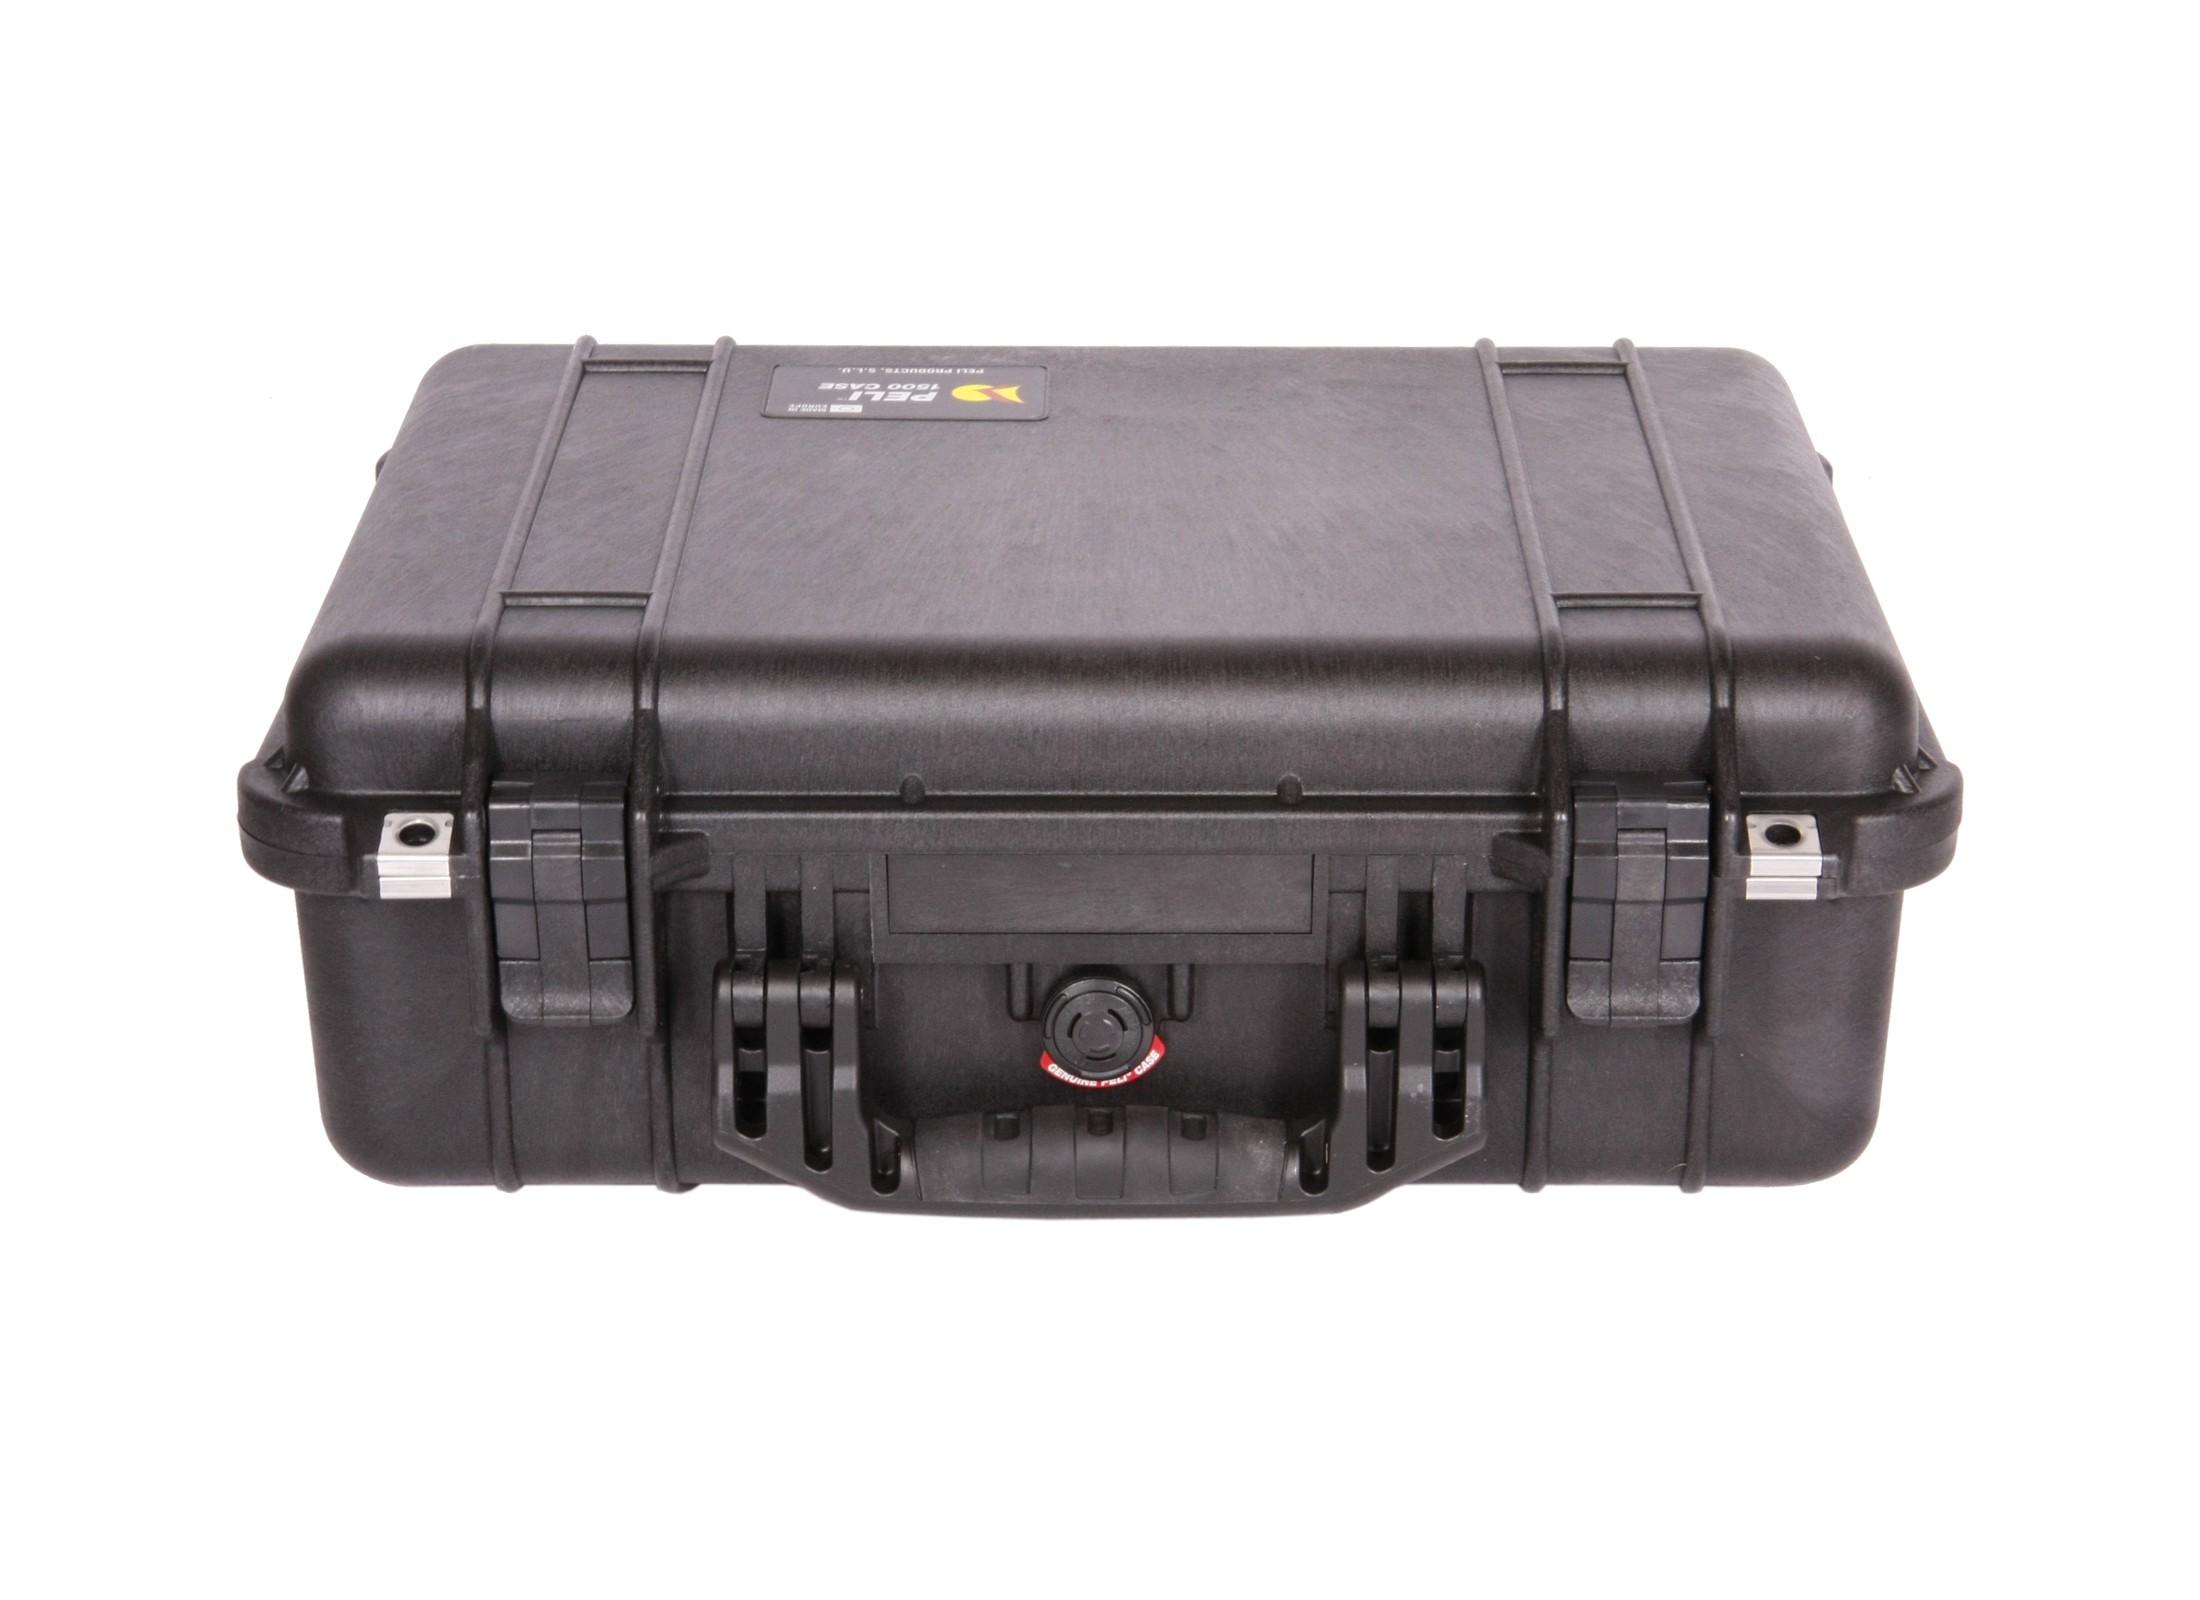 Peli 1500-000-110E Equipment Case, Plastic, waterproof, Inside ...